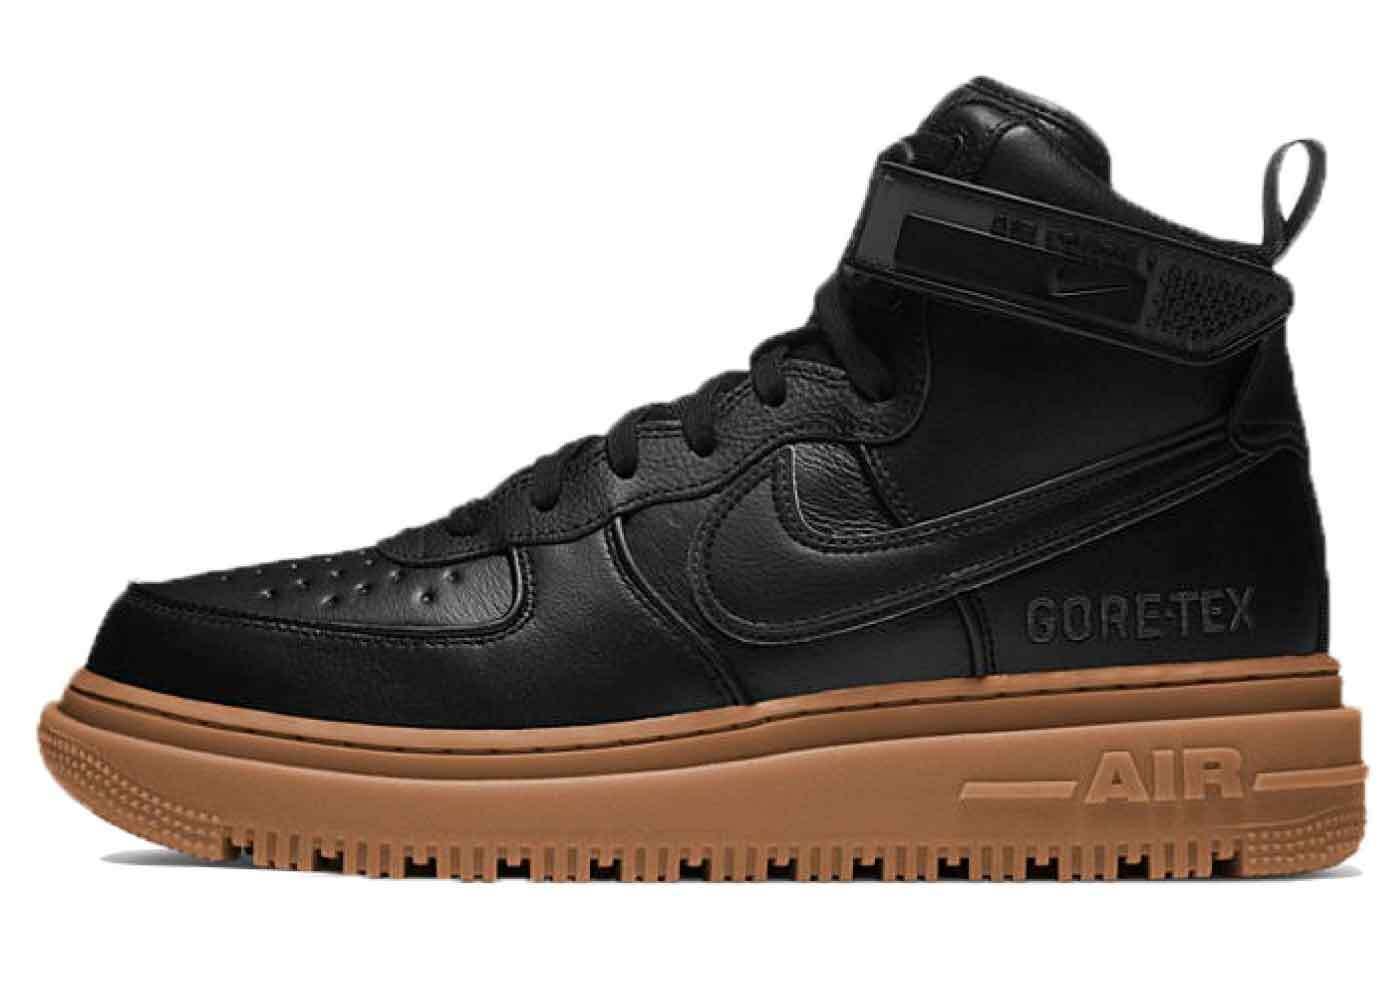 Nike Air Force 1 Gore-Tex Boot Black Gumの写真